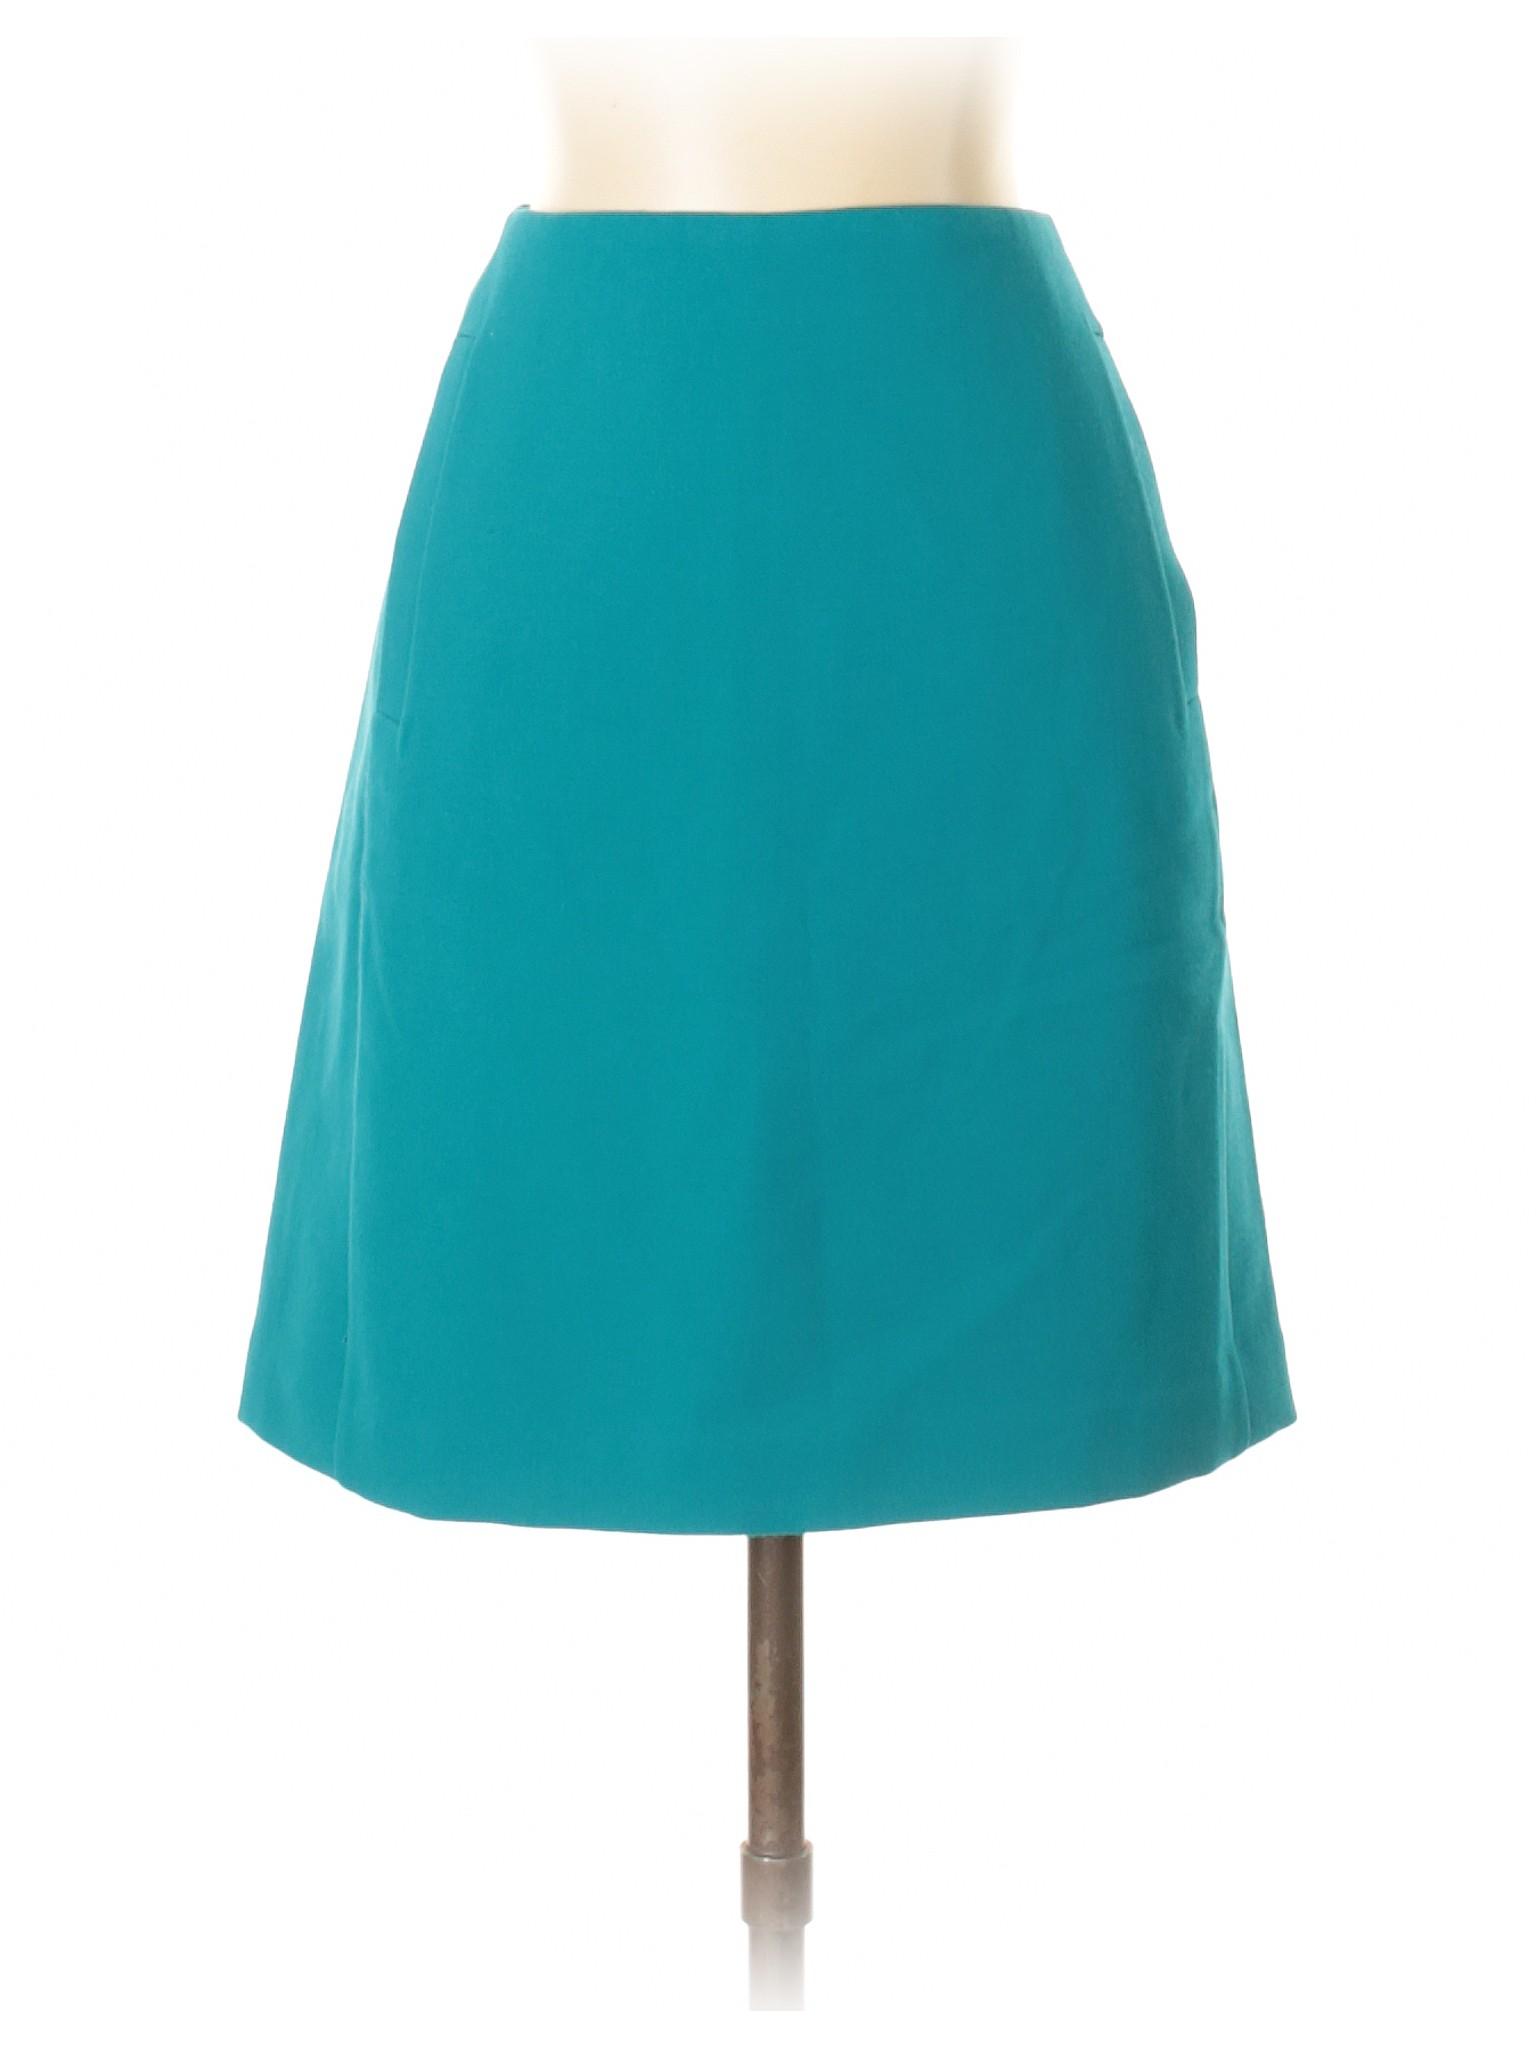 winter Leisure Casual Banana Skirt Republic 6wz6q1Zd